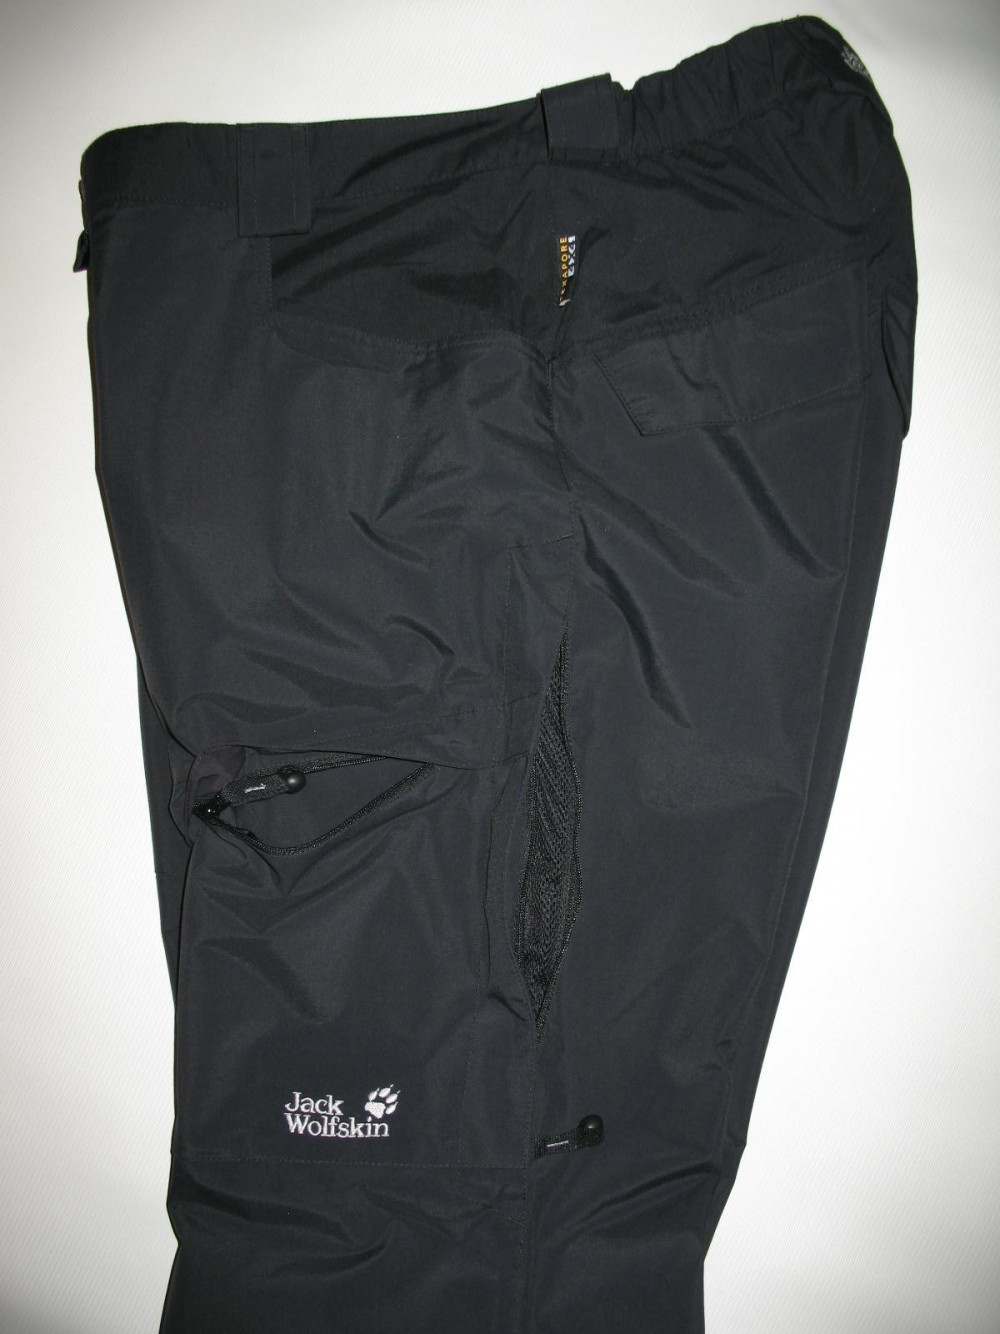 Штаны JACK WOLFSKIN texapore pants (размер M) - 4